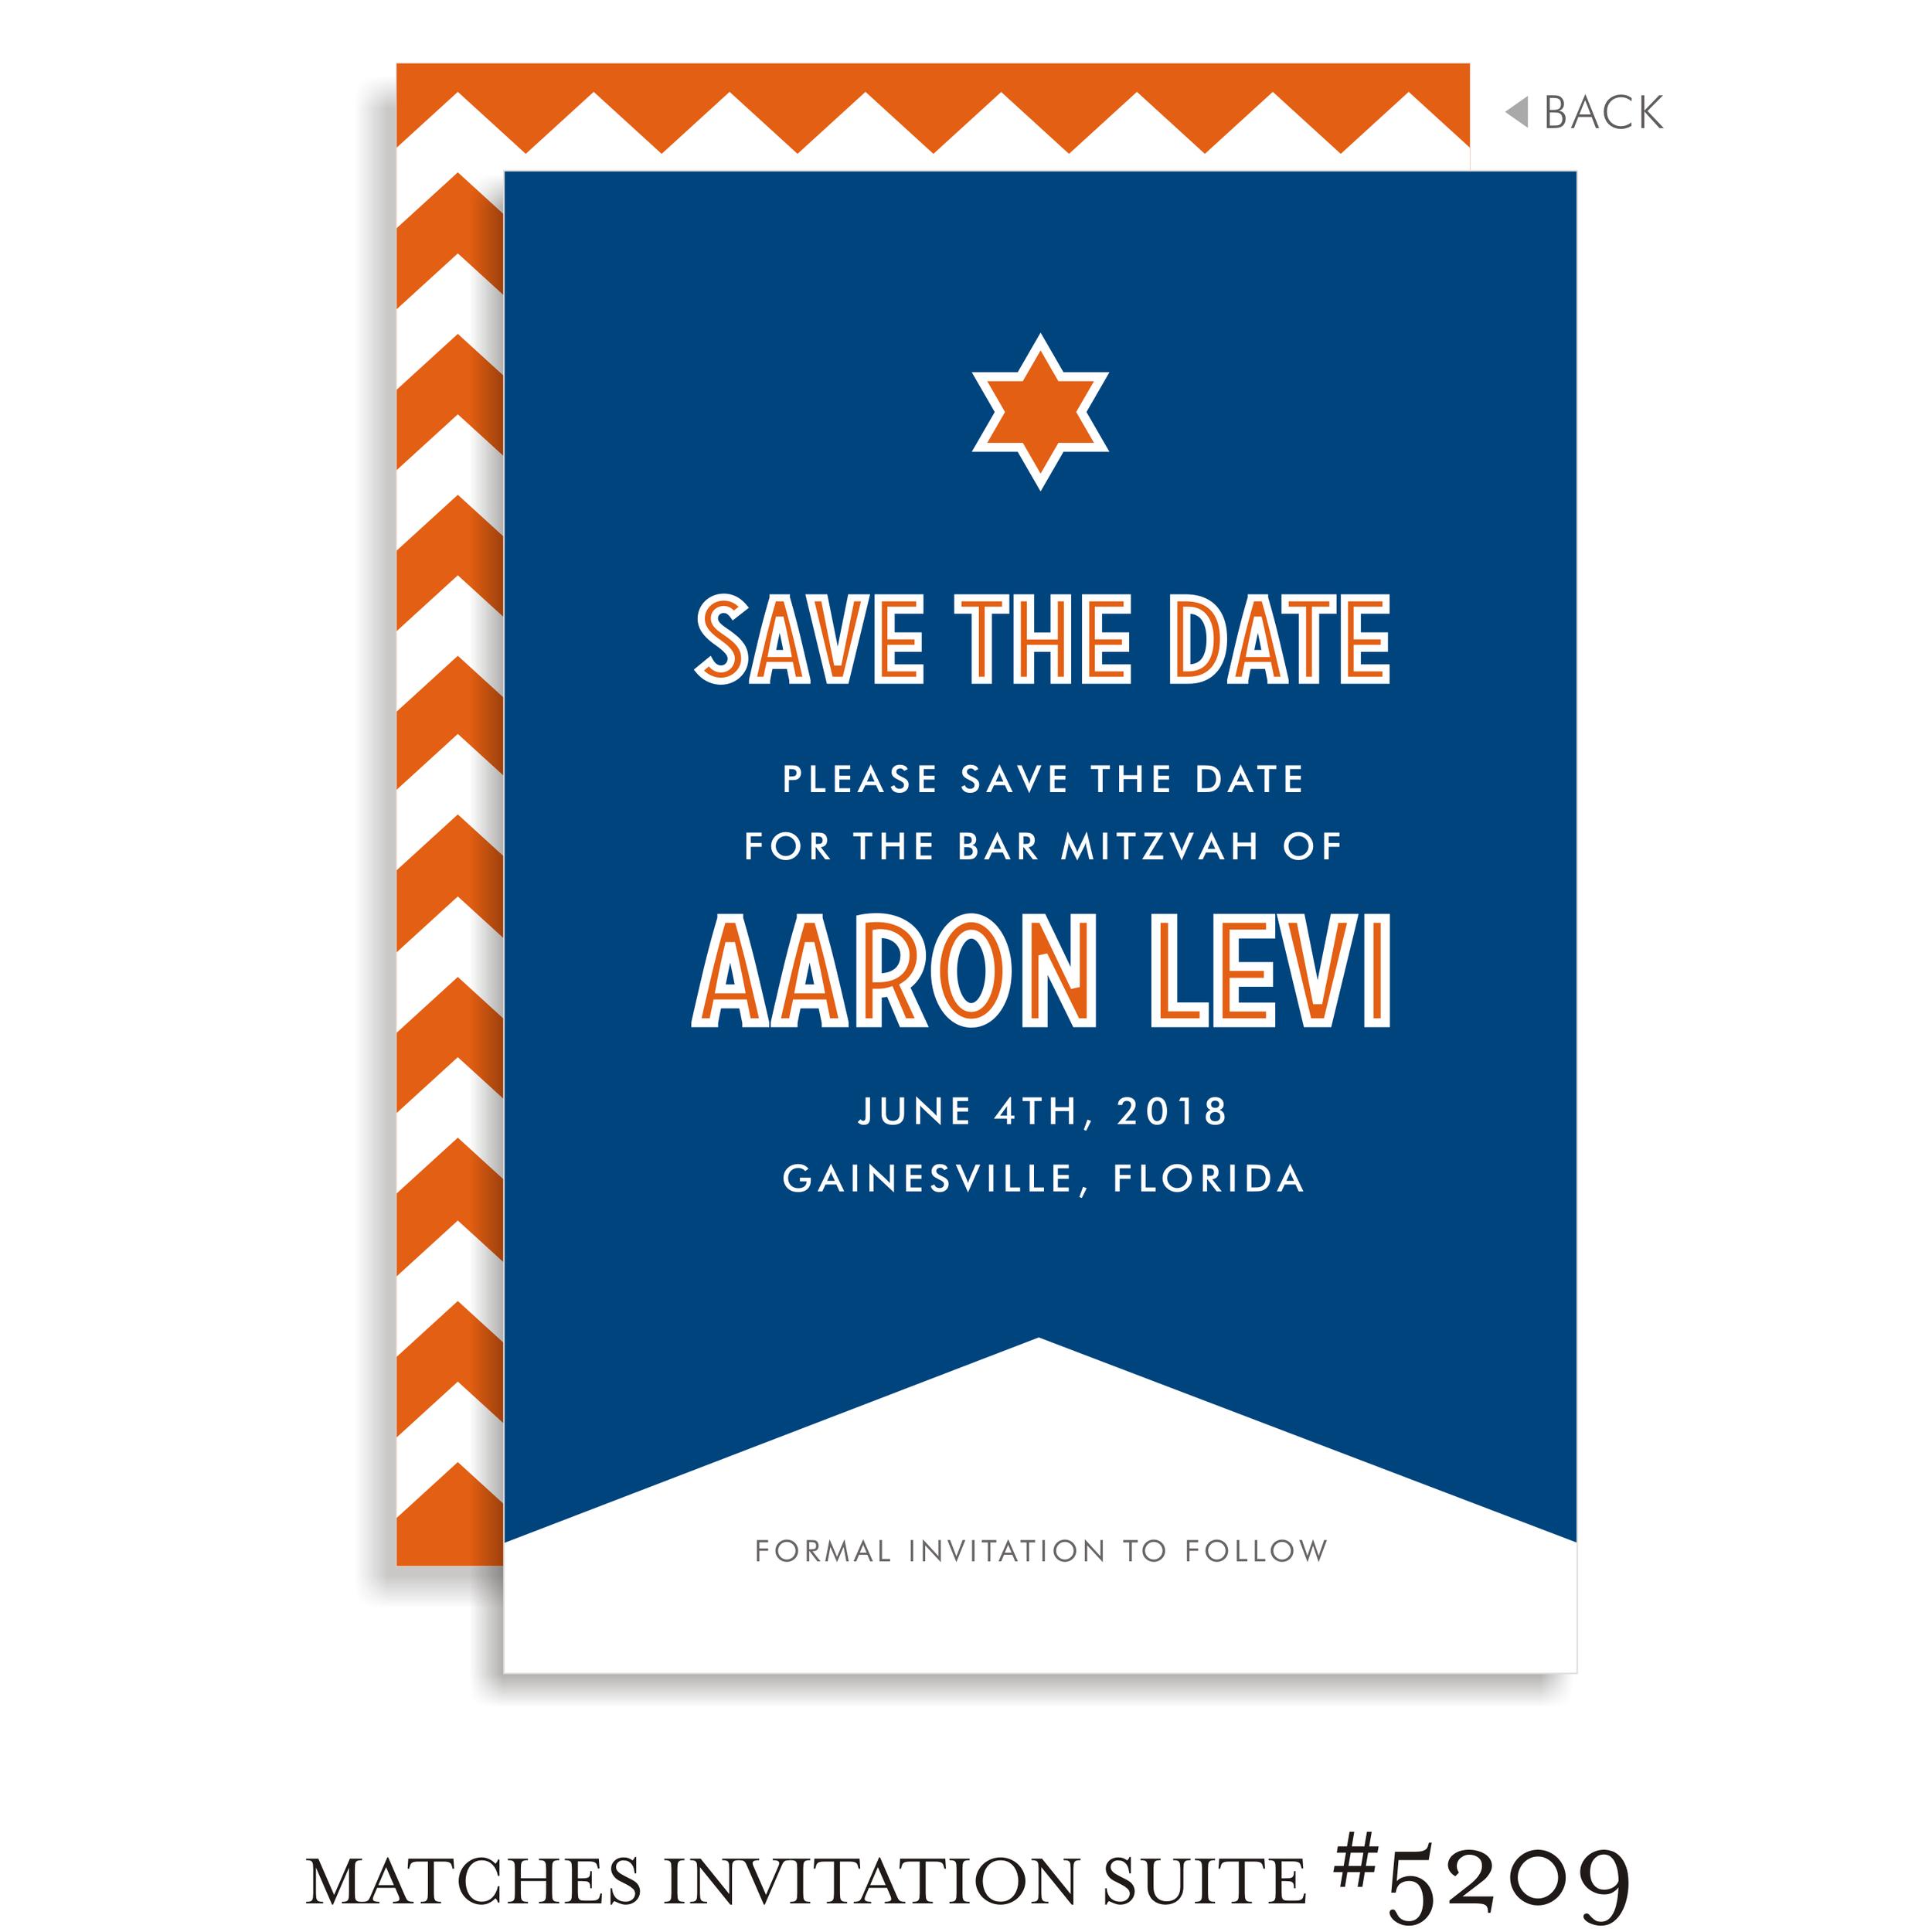 Save the Date Bar Mitzvah Suite 5209 - Aaron Levi